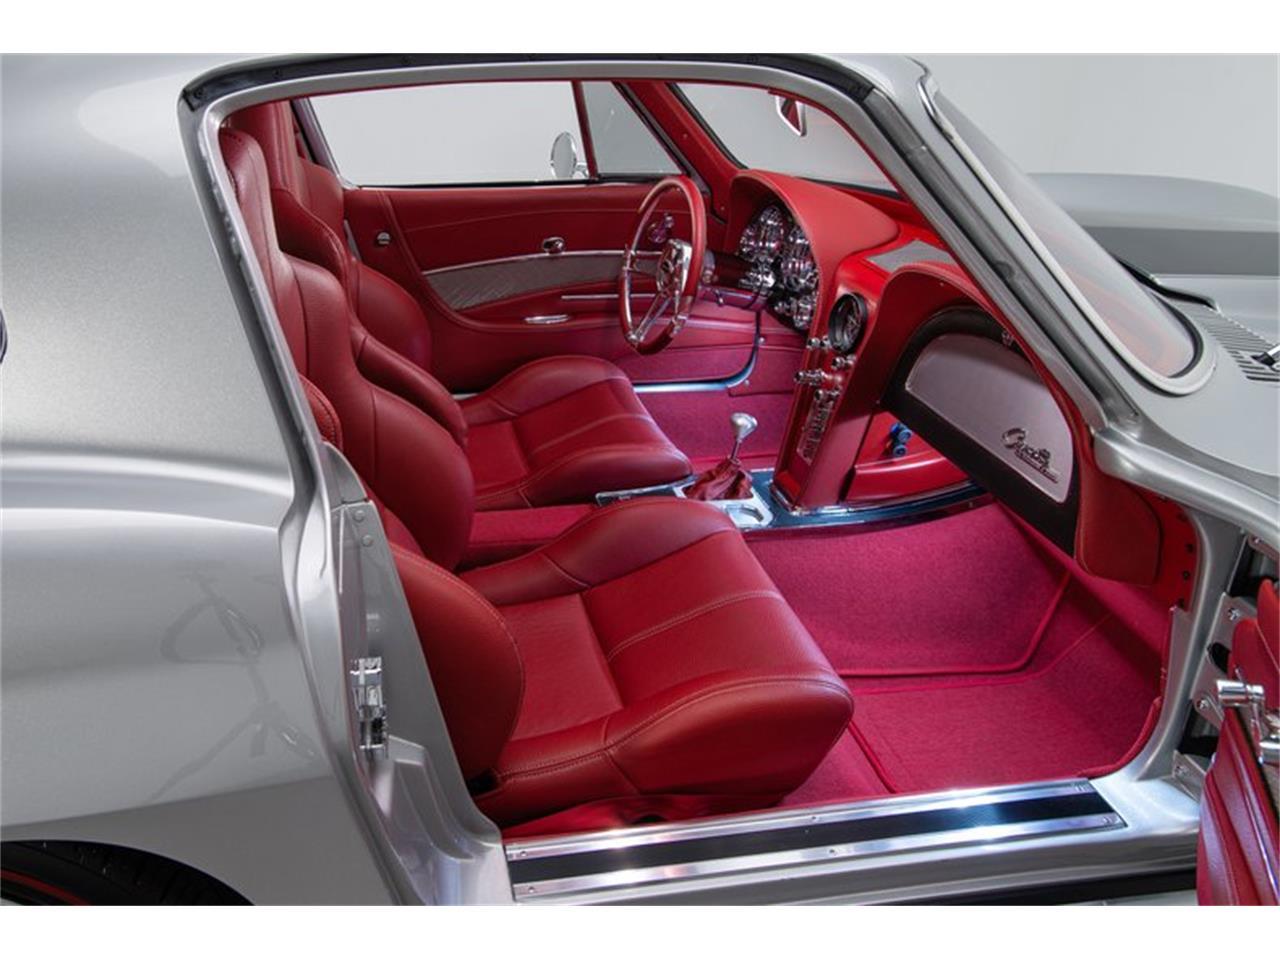 Large Picture of '67 Corvette located in Charlotte North Carolina - Q4OM